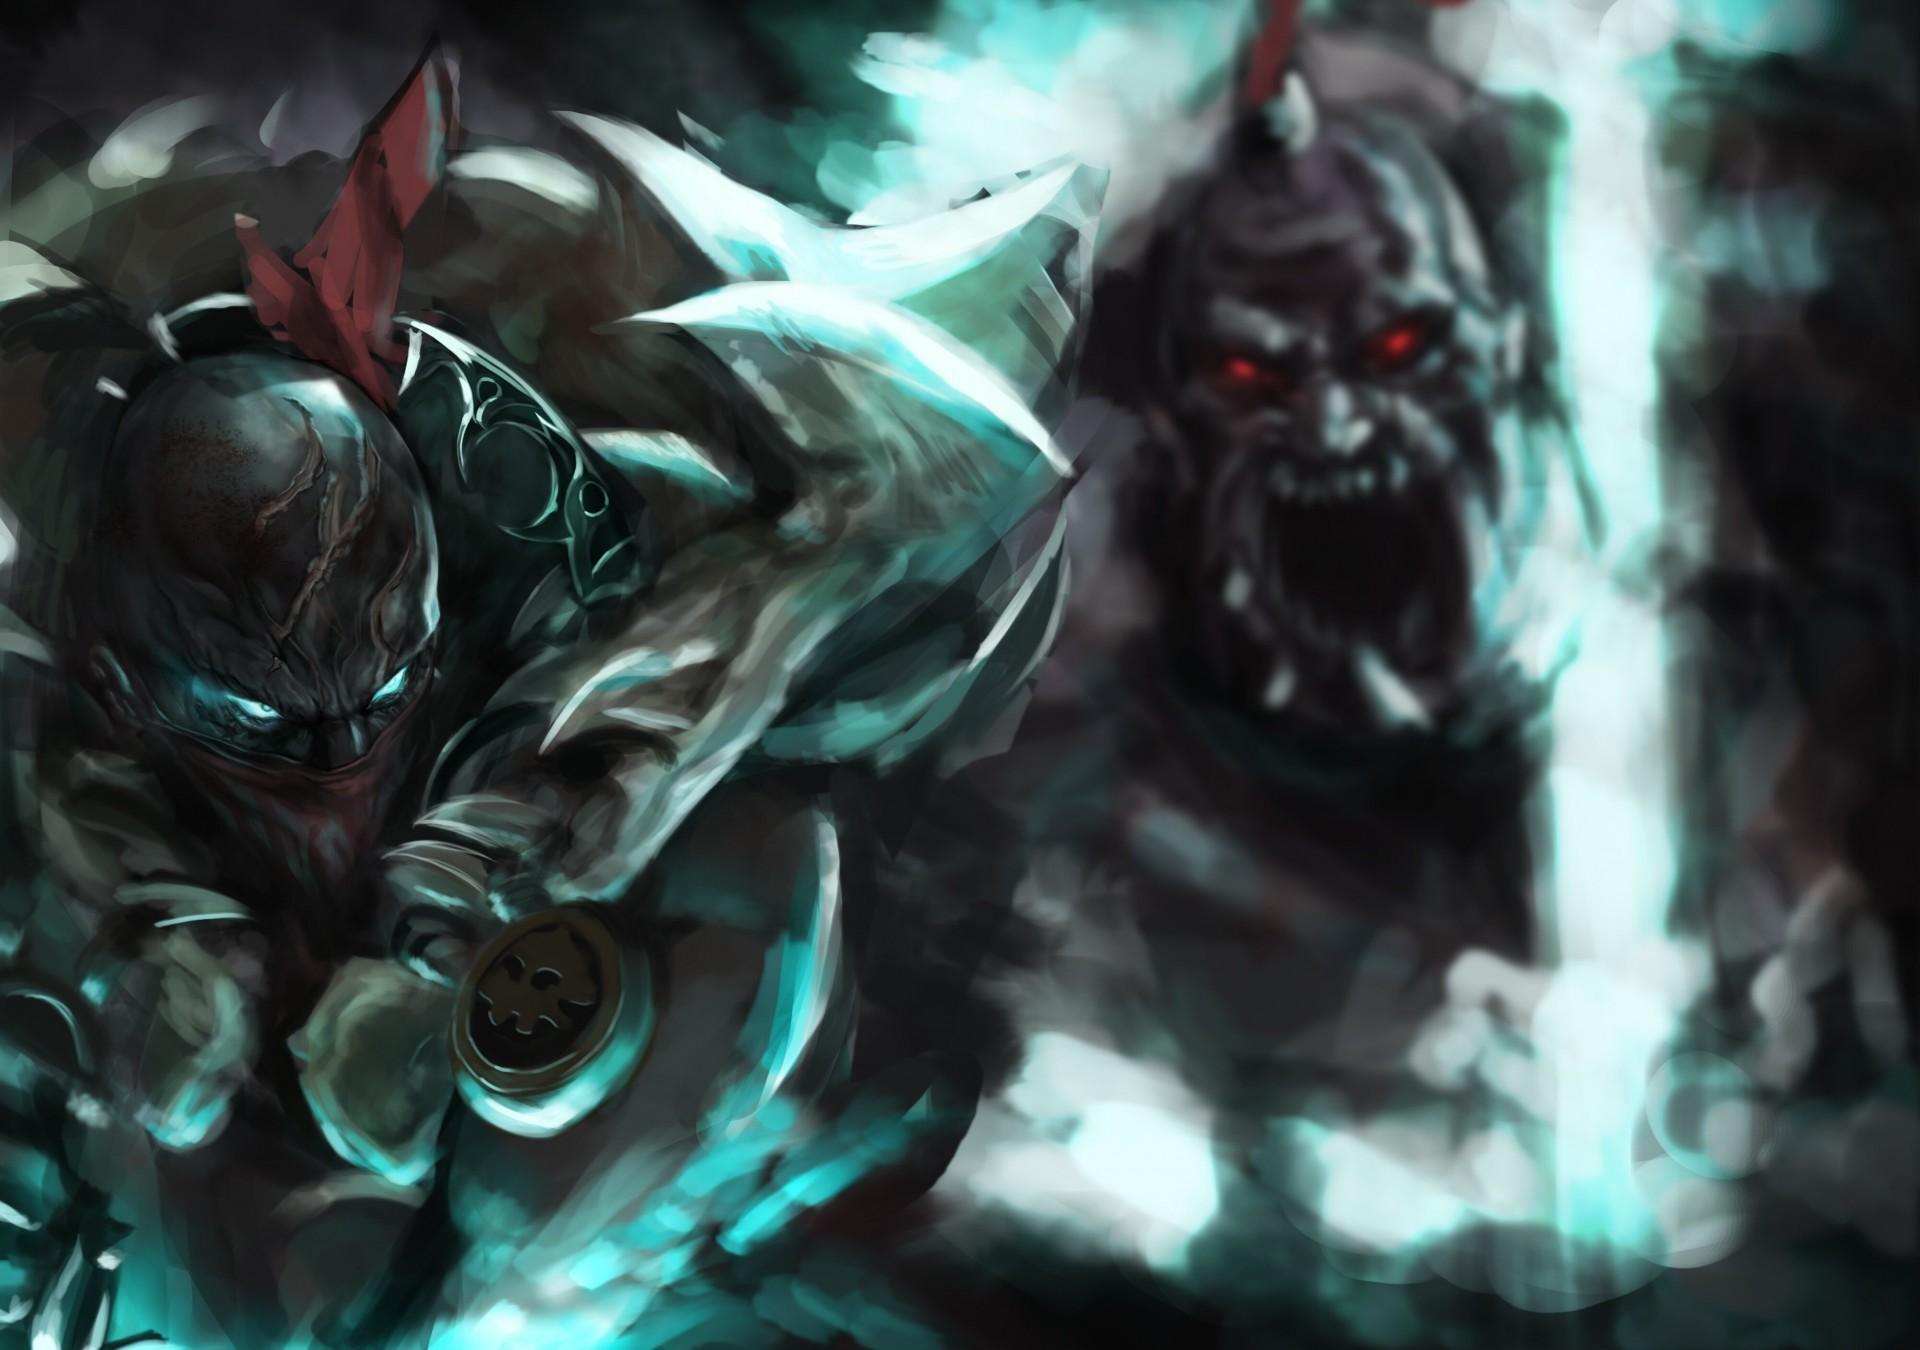 League of Legends: Pyke vs Sion - LoL Fanart - Inven Global